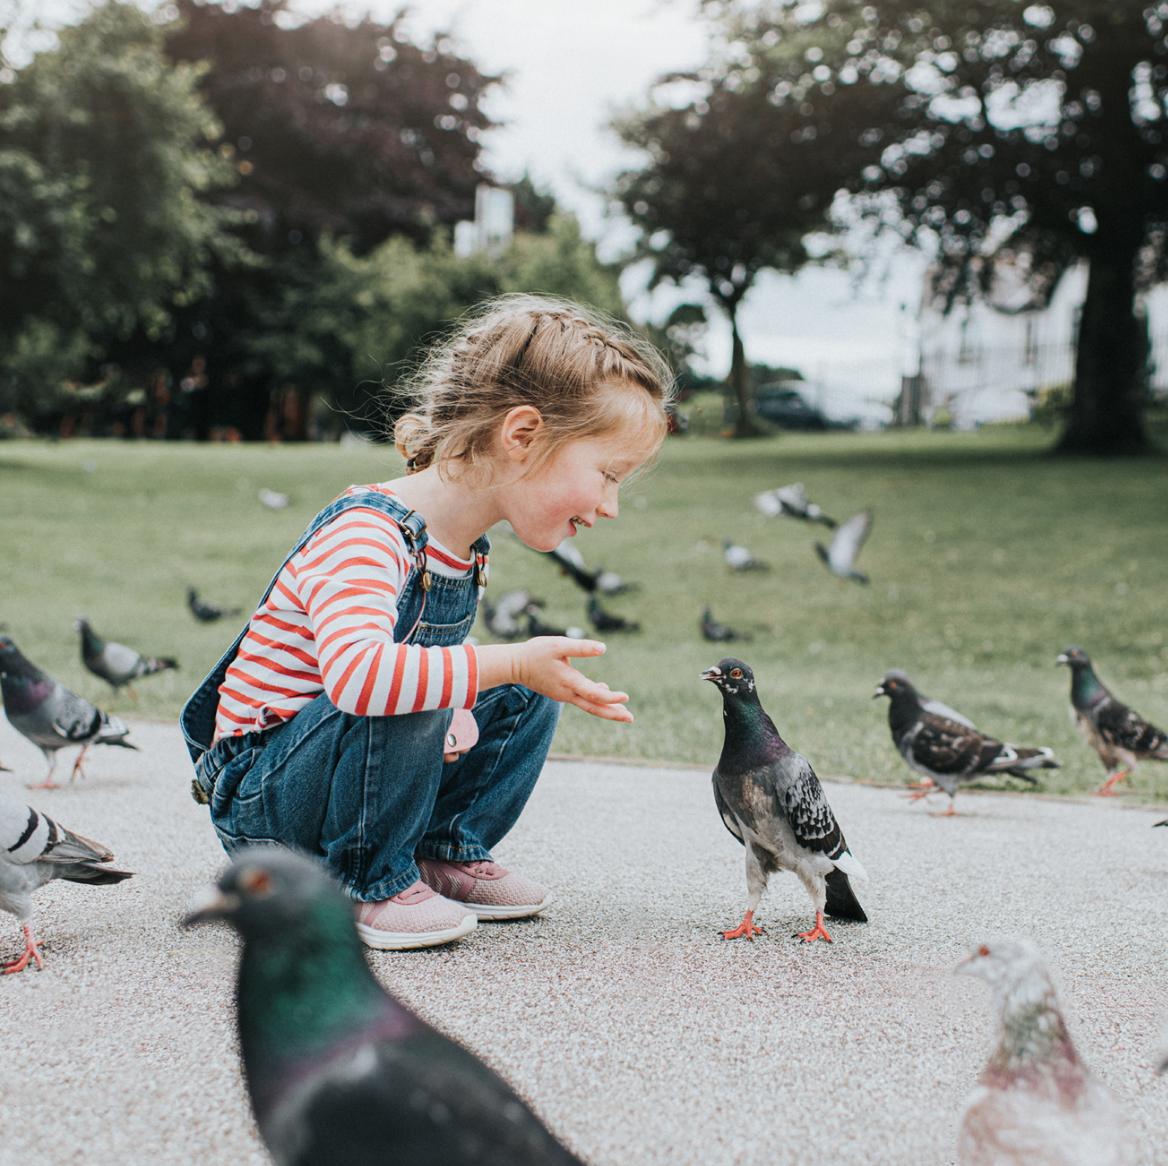 meisje-klein-vogels-lachen-natuur-kleuter-kind-kindje-vogels-duiven-duif-aaien